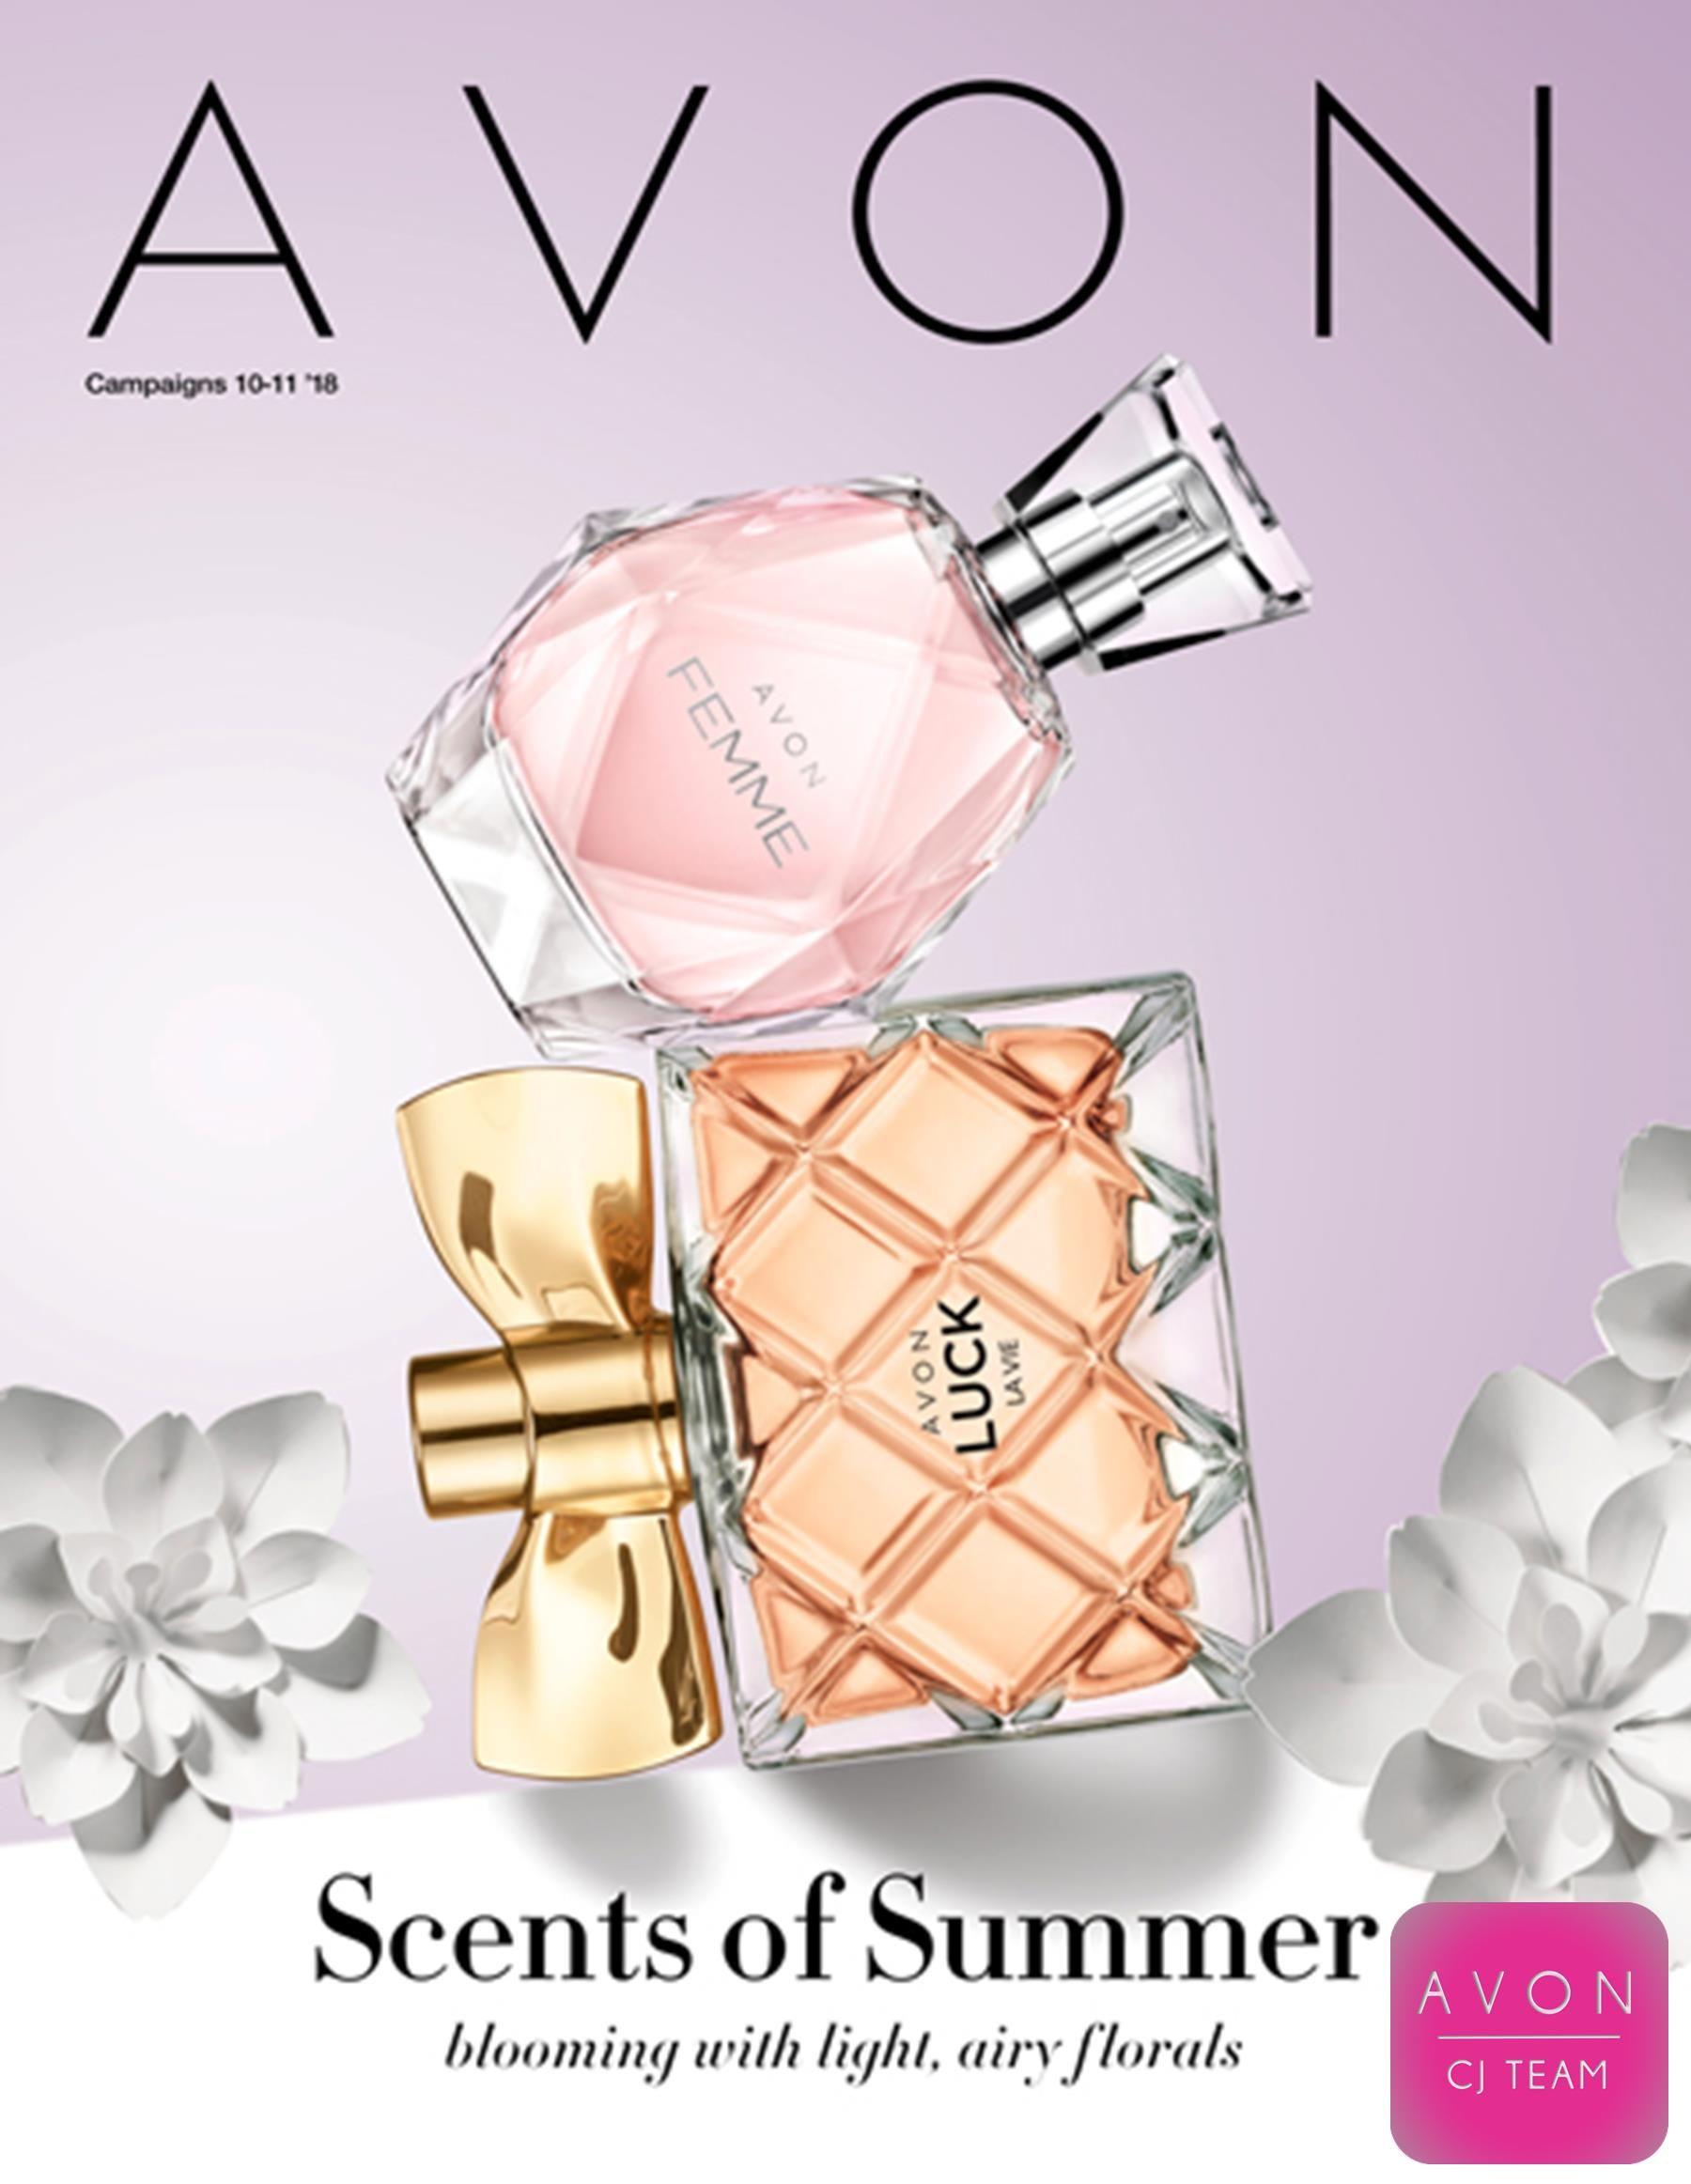 catalogue avon noel 2018 Avon Campaign 10/11, 2018   #Scents of Summer! #Avon Sales #Flyer  catalogue avon noel 2018